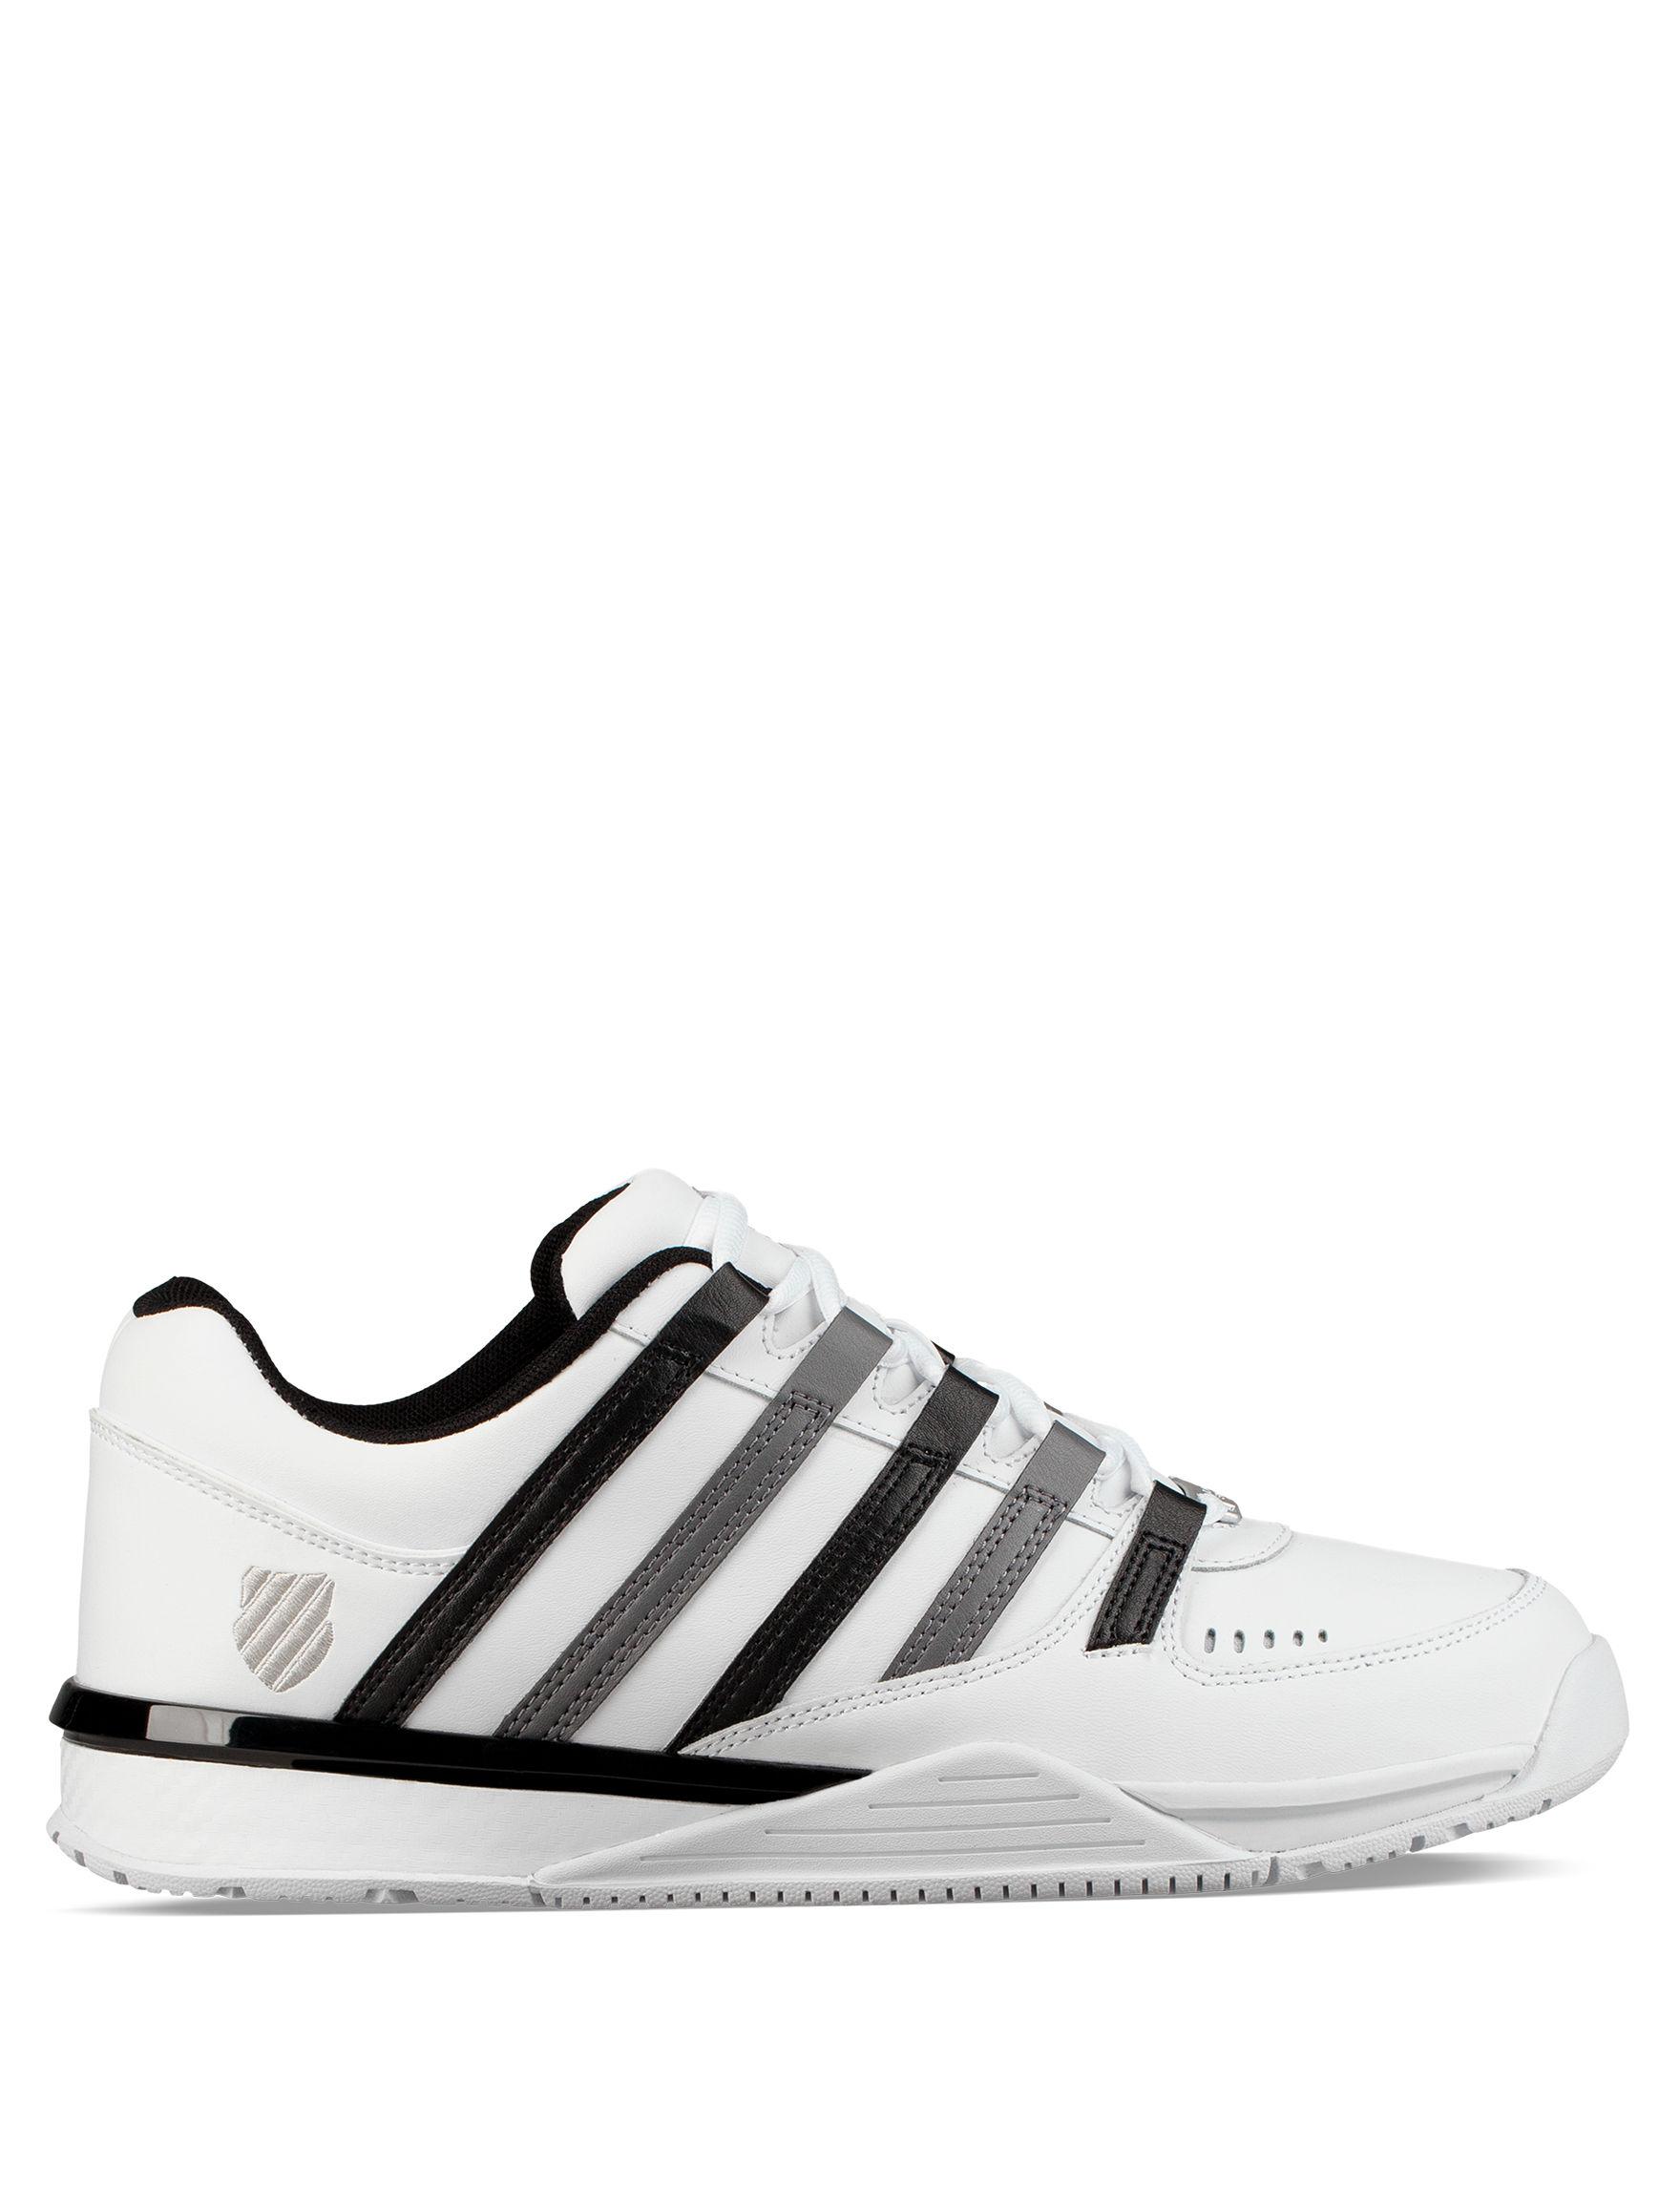 K-Swiss White / Black